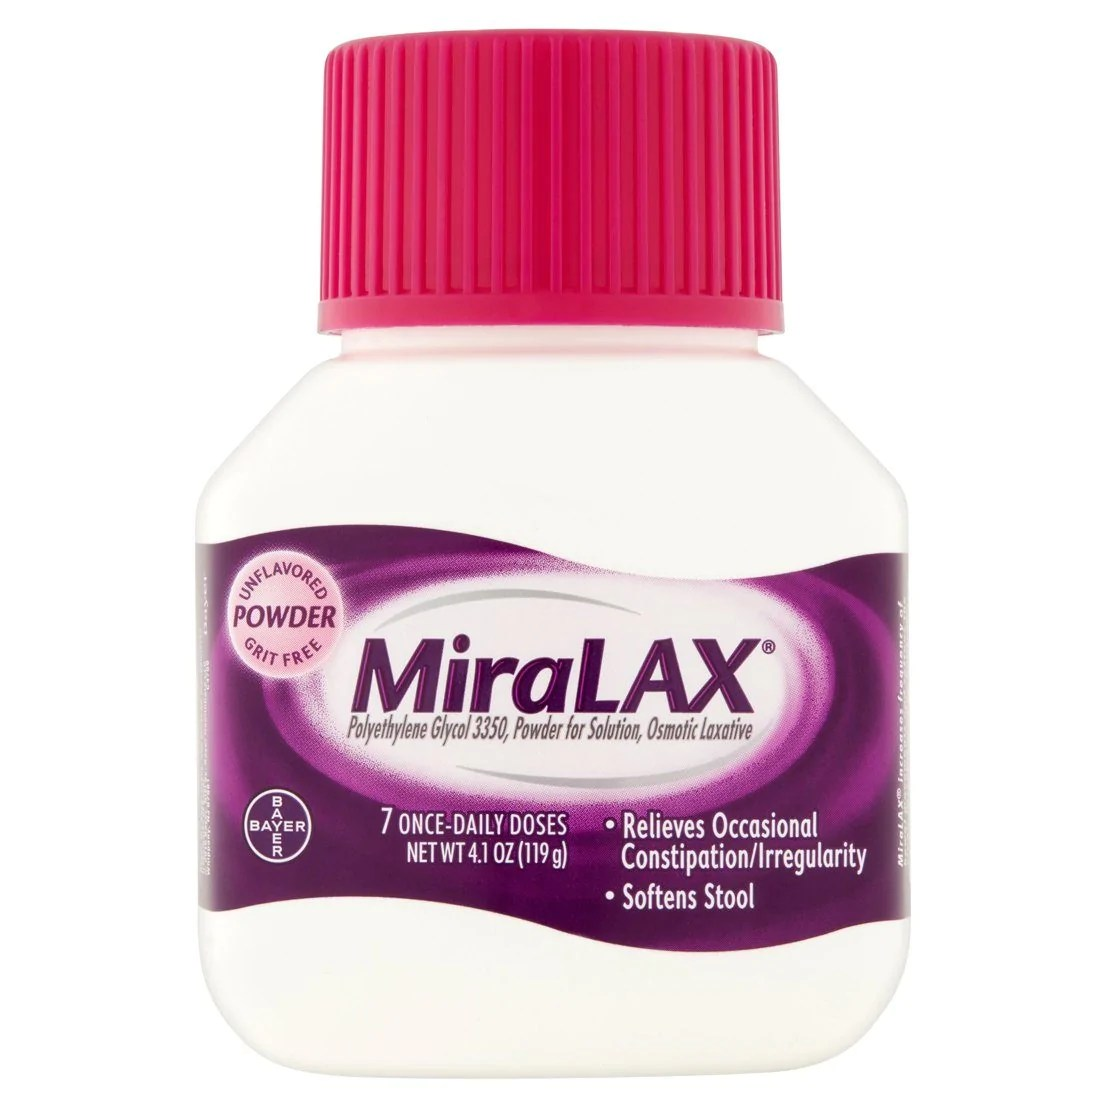 MiraLAX Powder Laxative Constipation Drink 4.1 oz